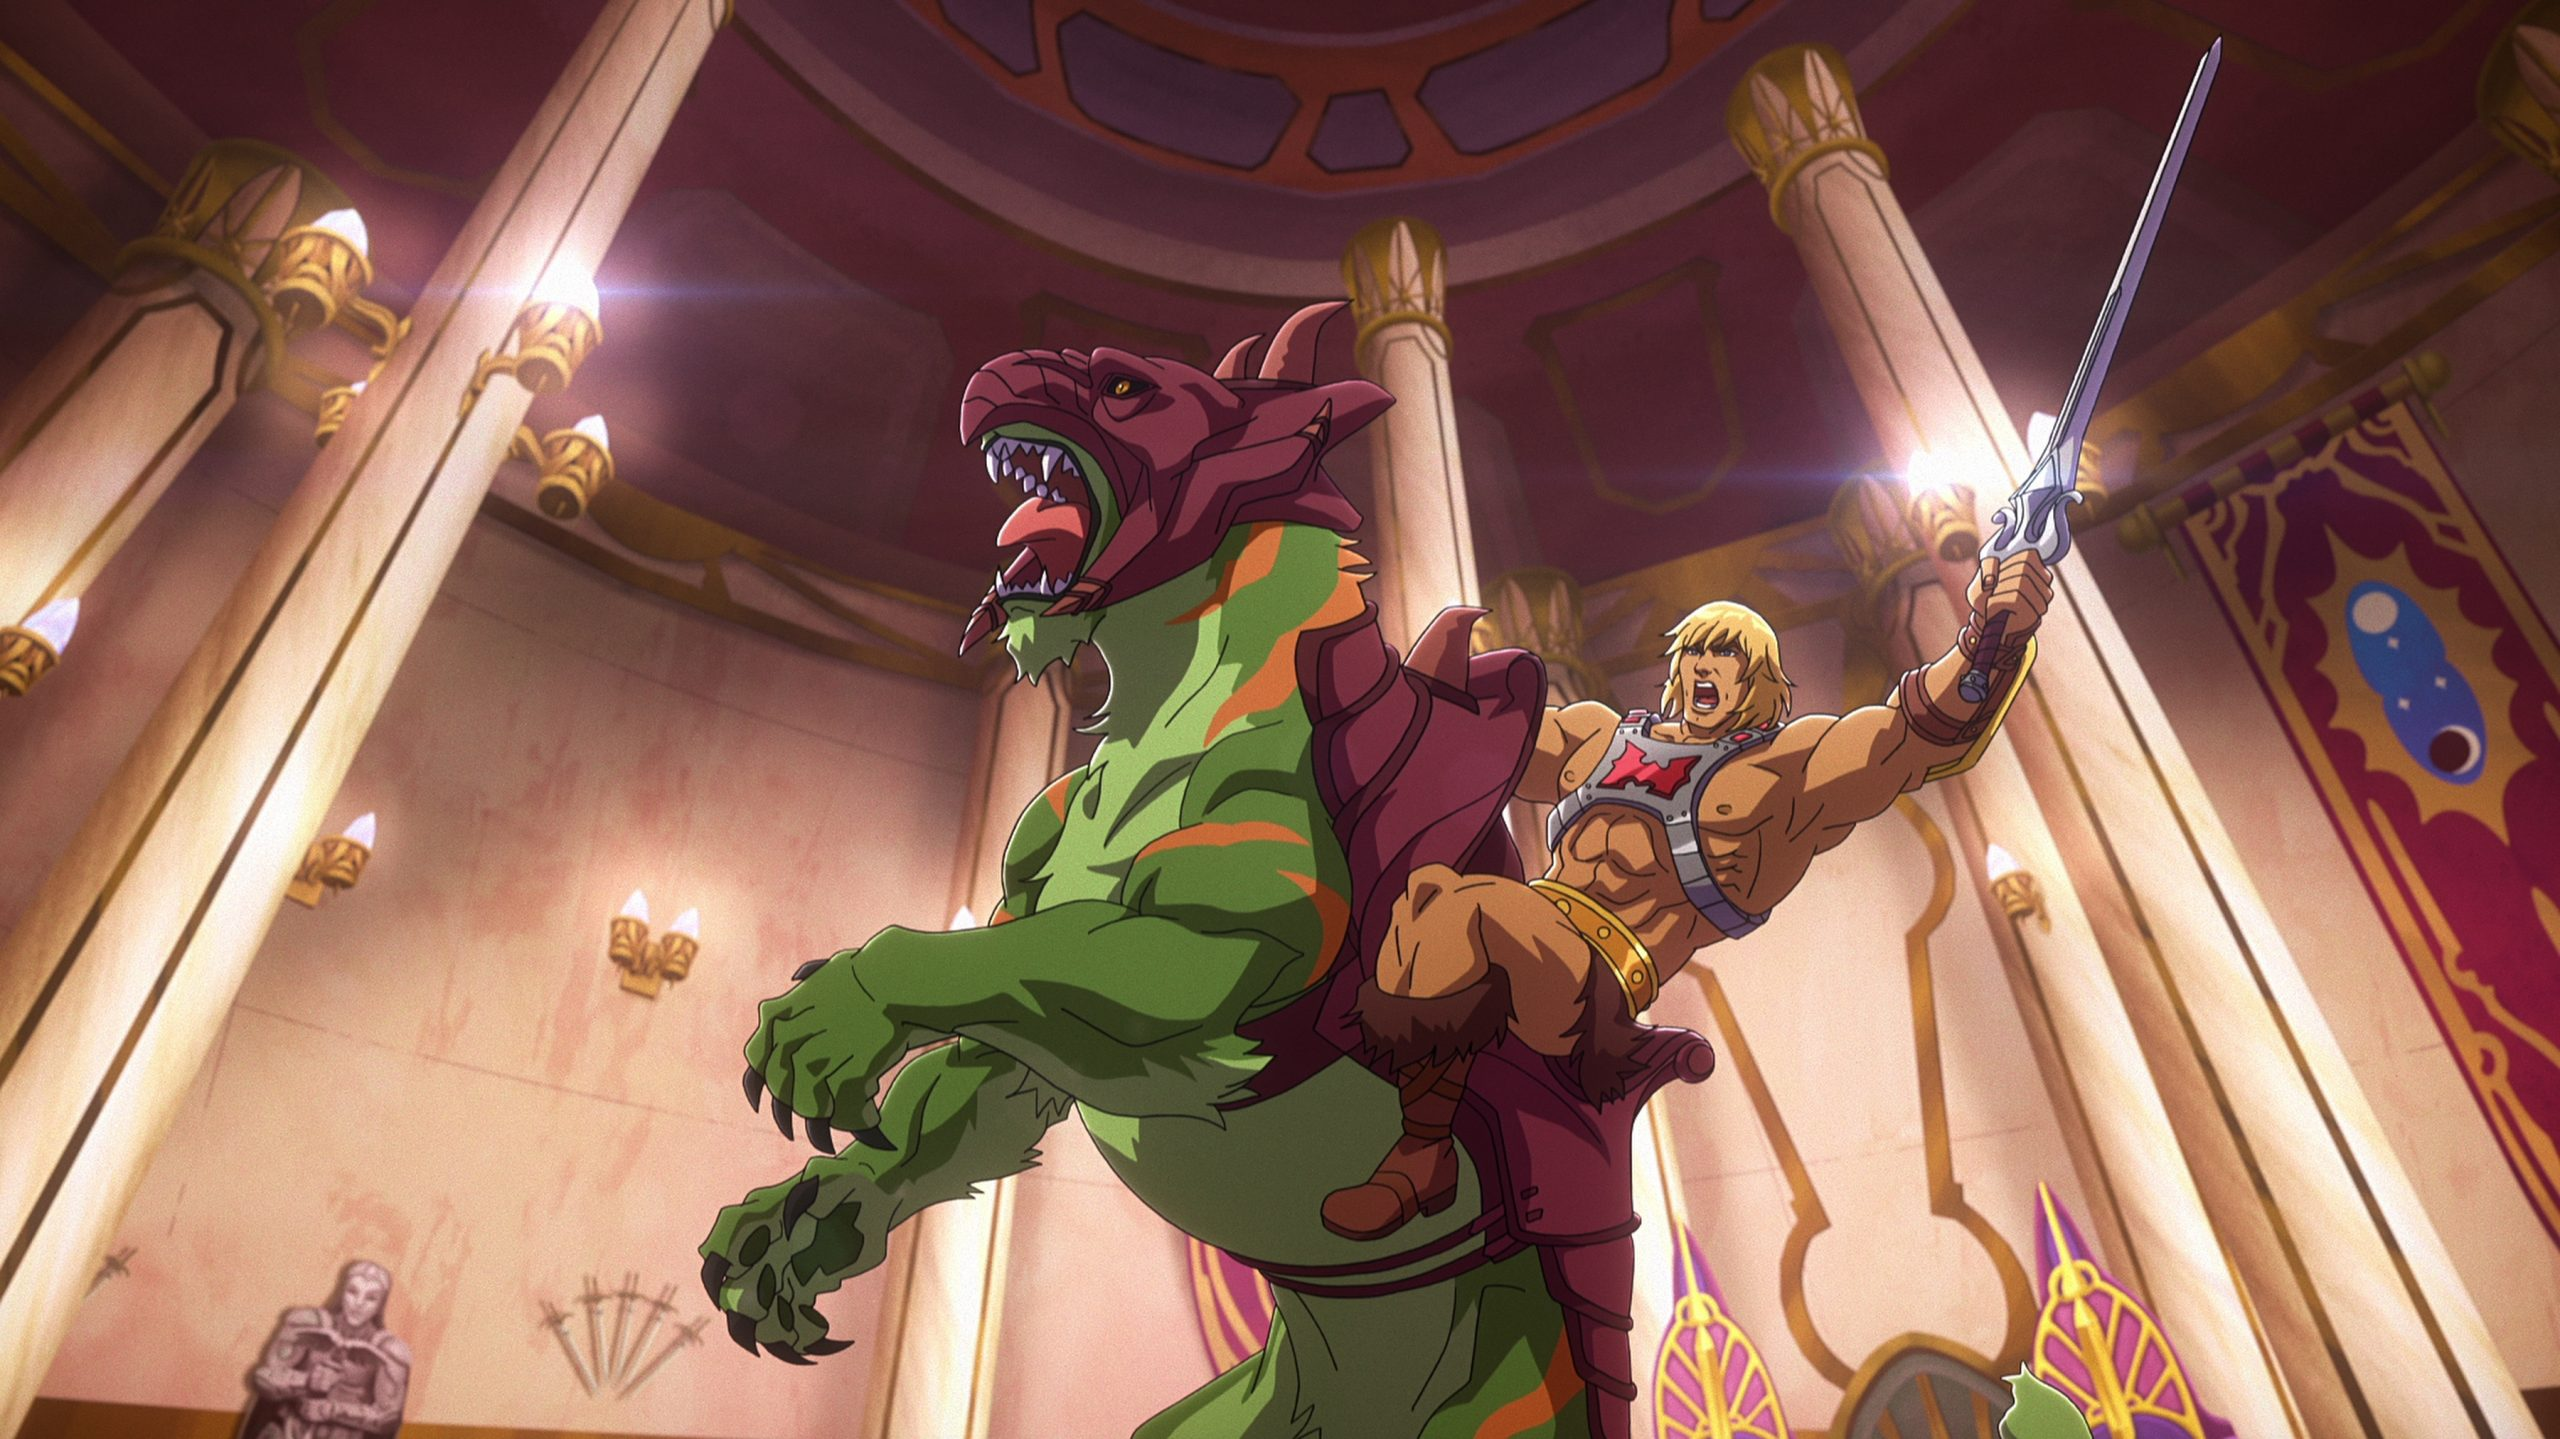 ¡He-Man está de vuelta! Checa el primer teaser de 'Masters of the Universe: Revelation'